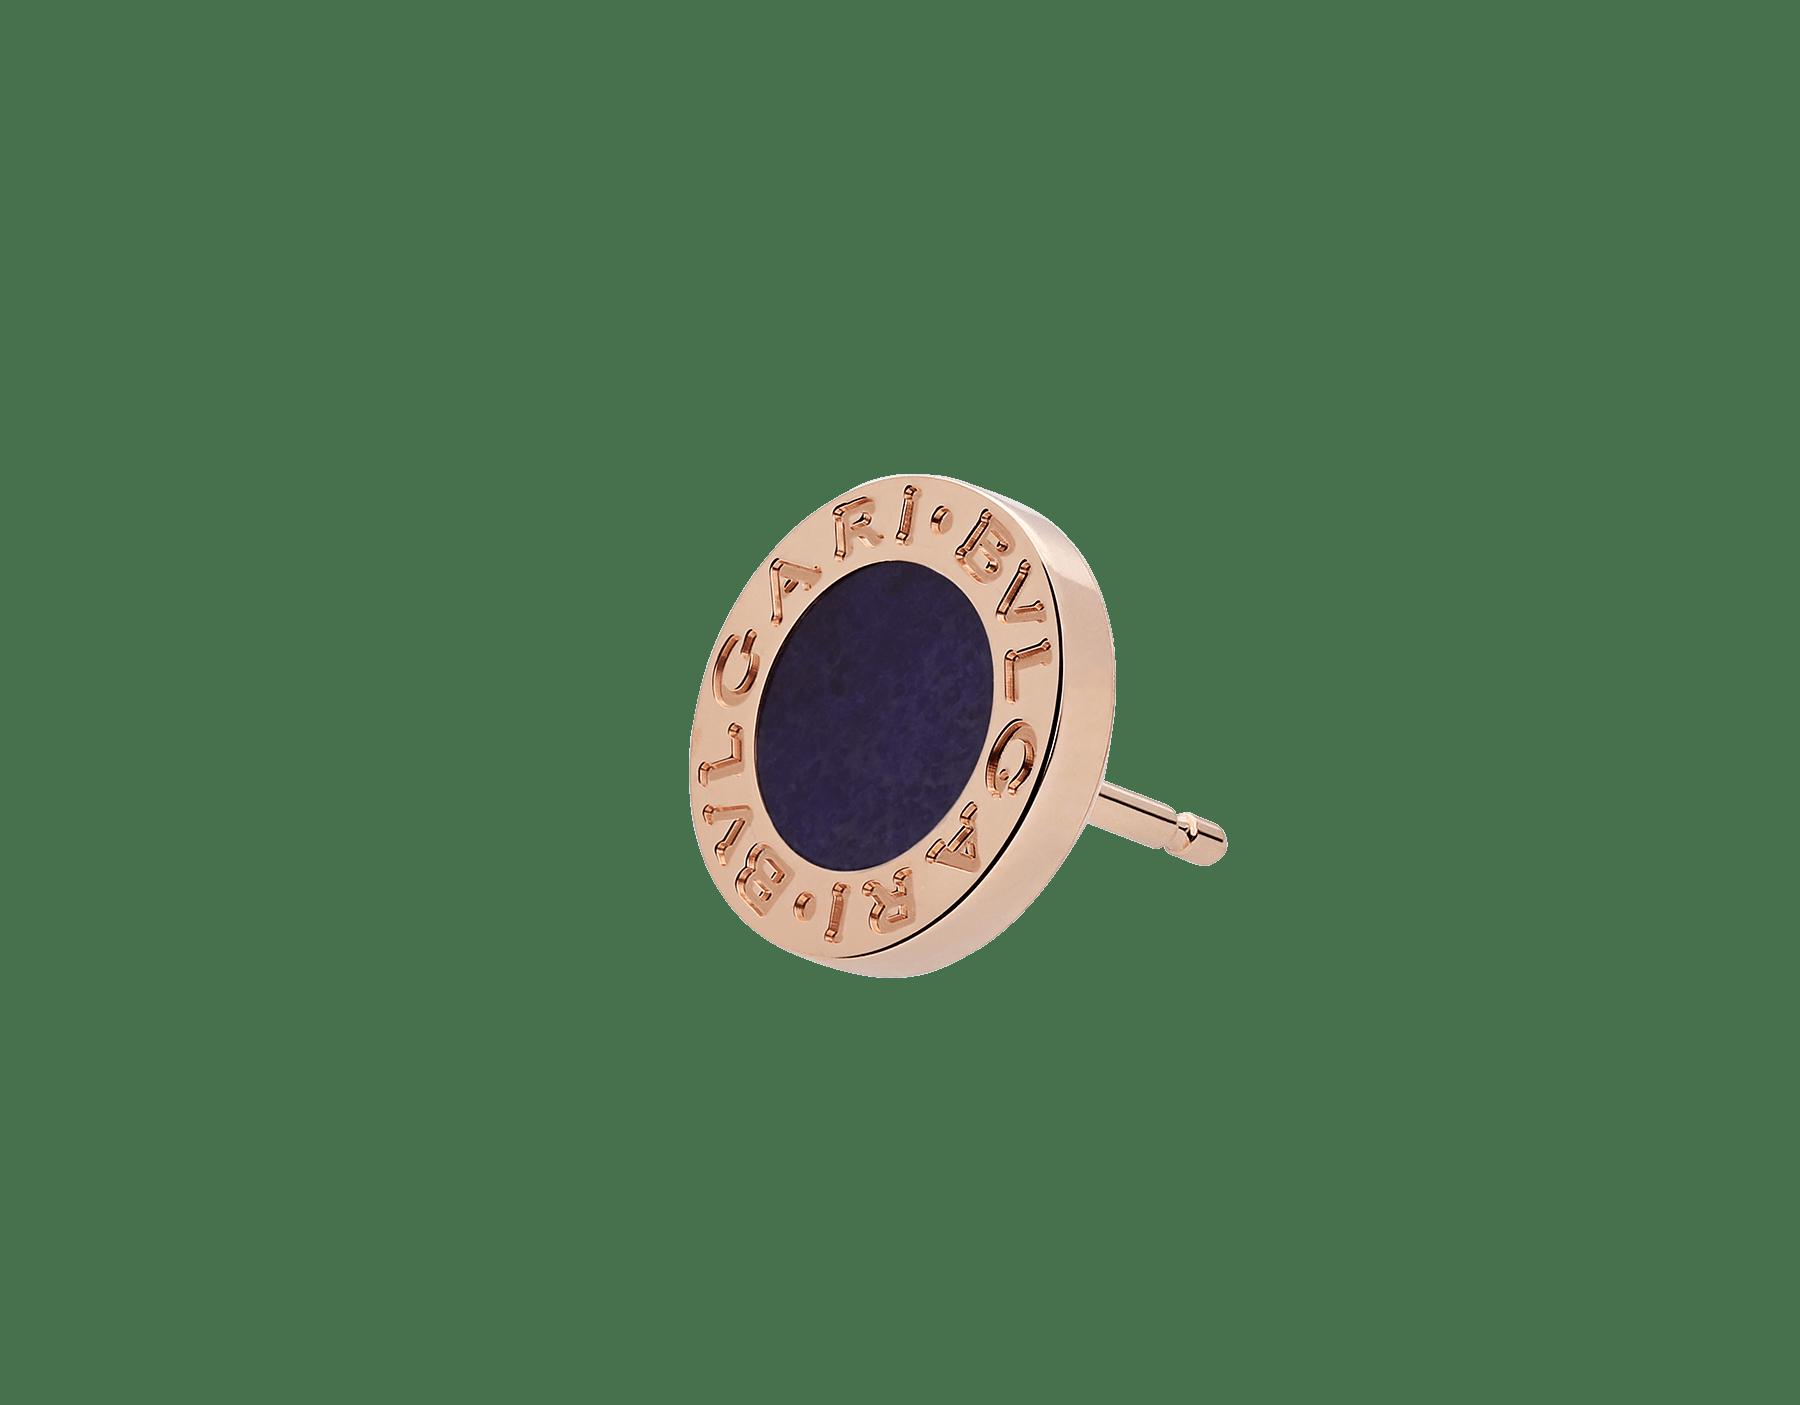 BVLGARI BVLGARI 18 kt rose gold single earring set with sugilite element 356428 image 2